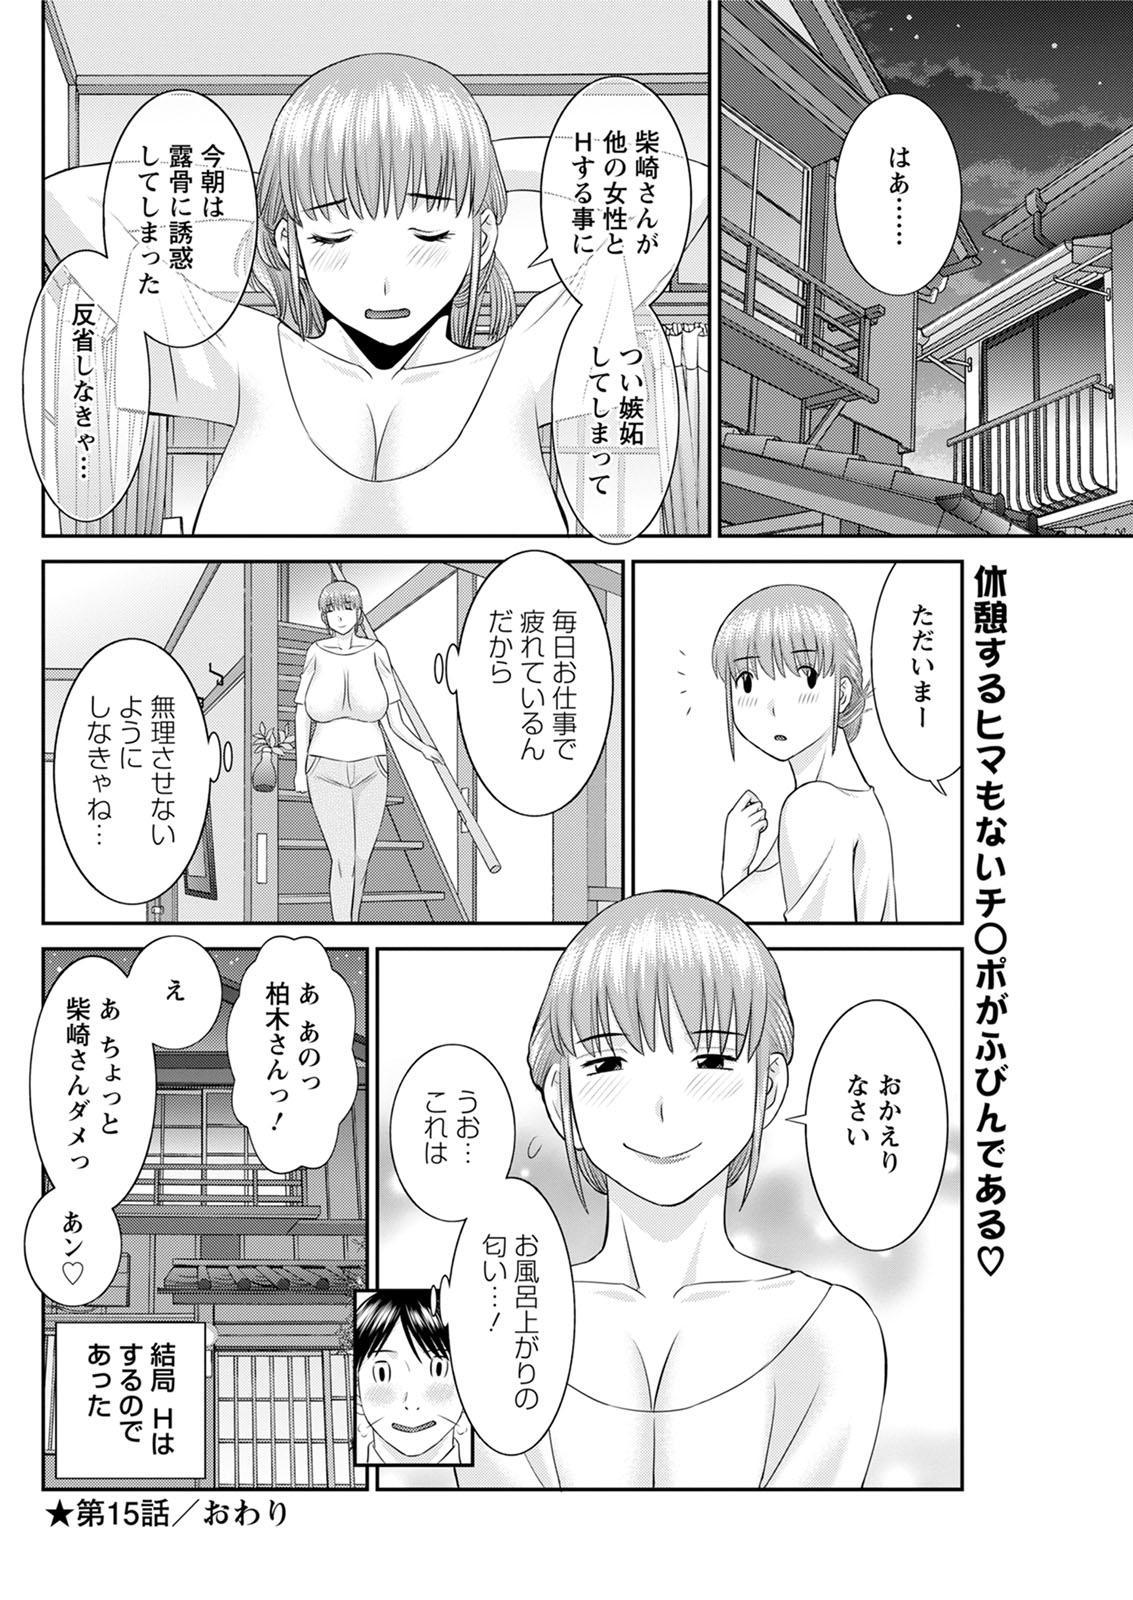 [Kawamori Misaki] Kaikan Hitotsuma Gakuen Ch. 1-6, 8-16 [Digital] 256